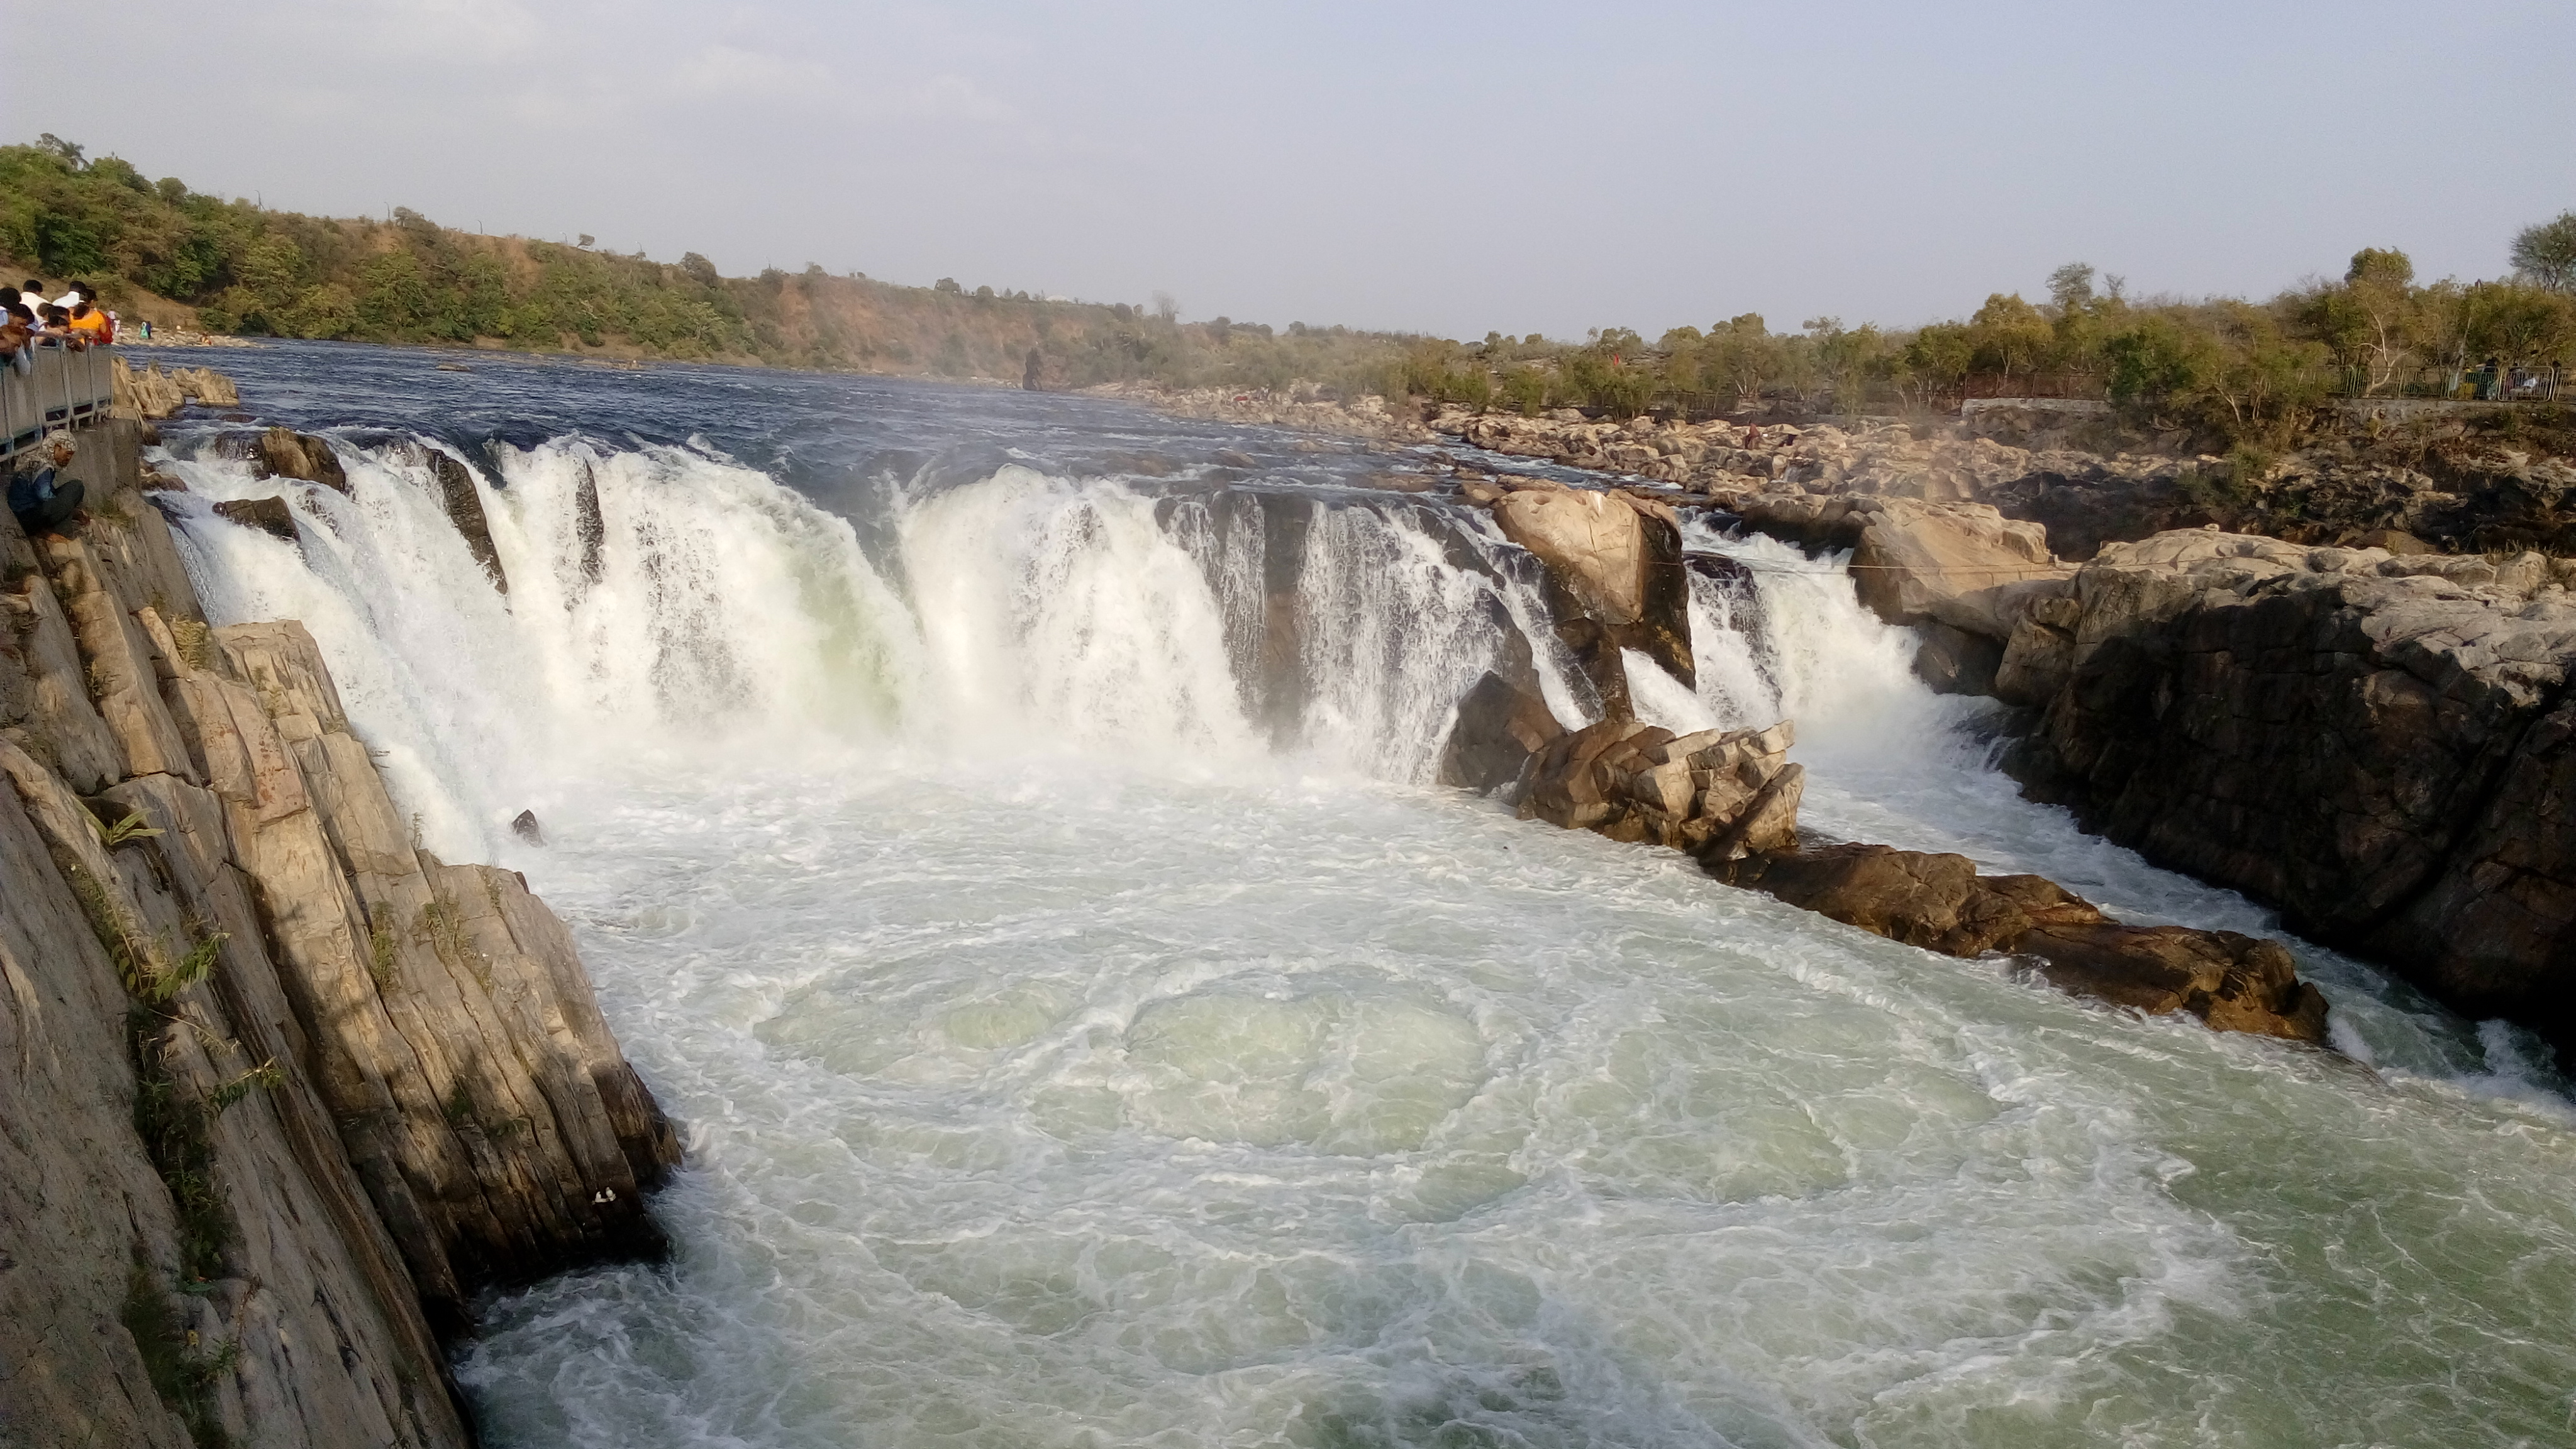 File:Dhuandhar Falls, Bhedaghat.jpg - Wikimedia Commons